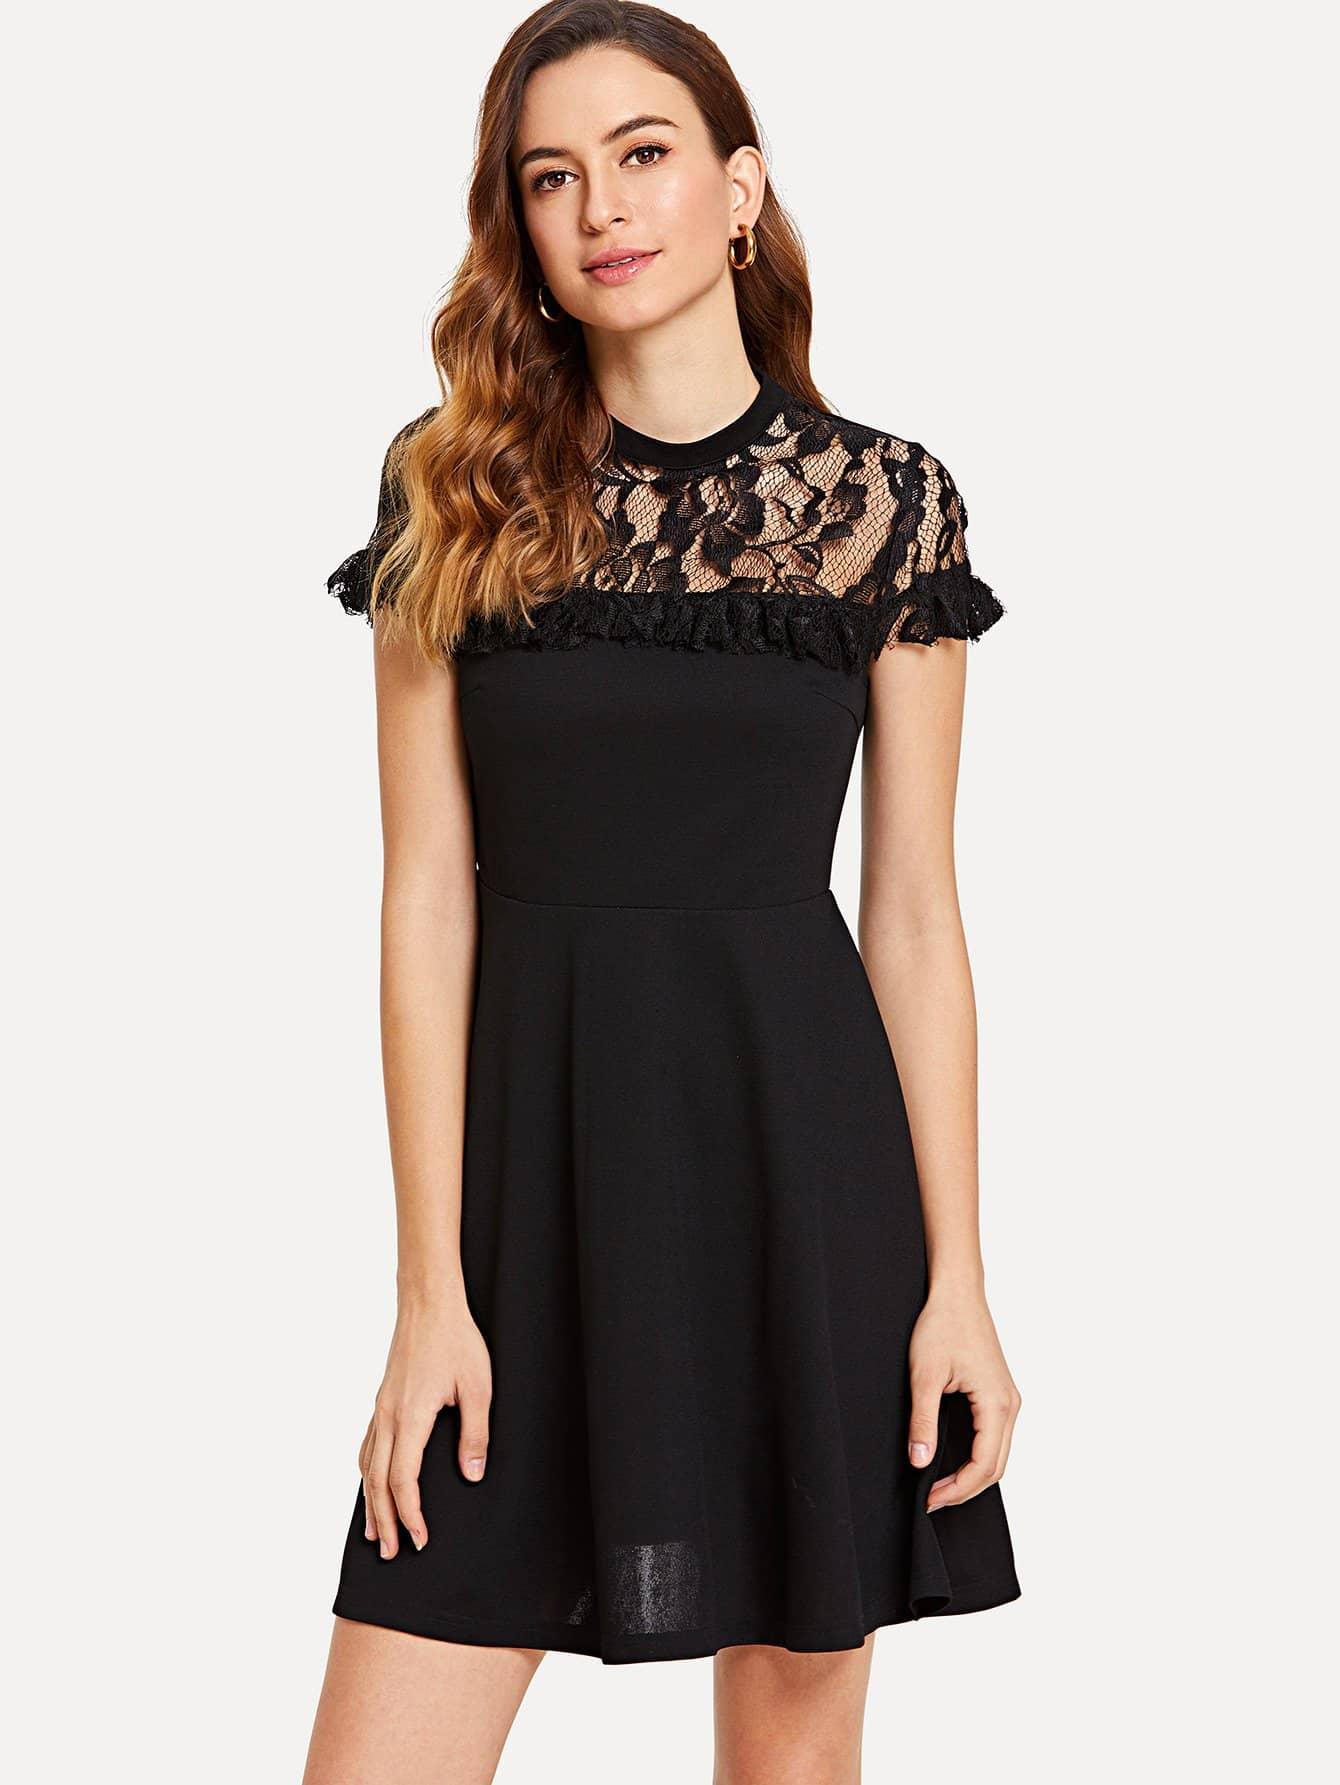 Floral Lace Yoke Skater Dress floral lace yoke skater dress